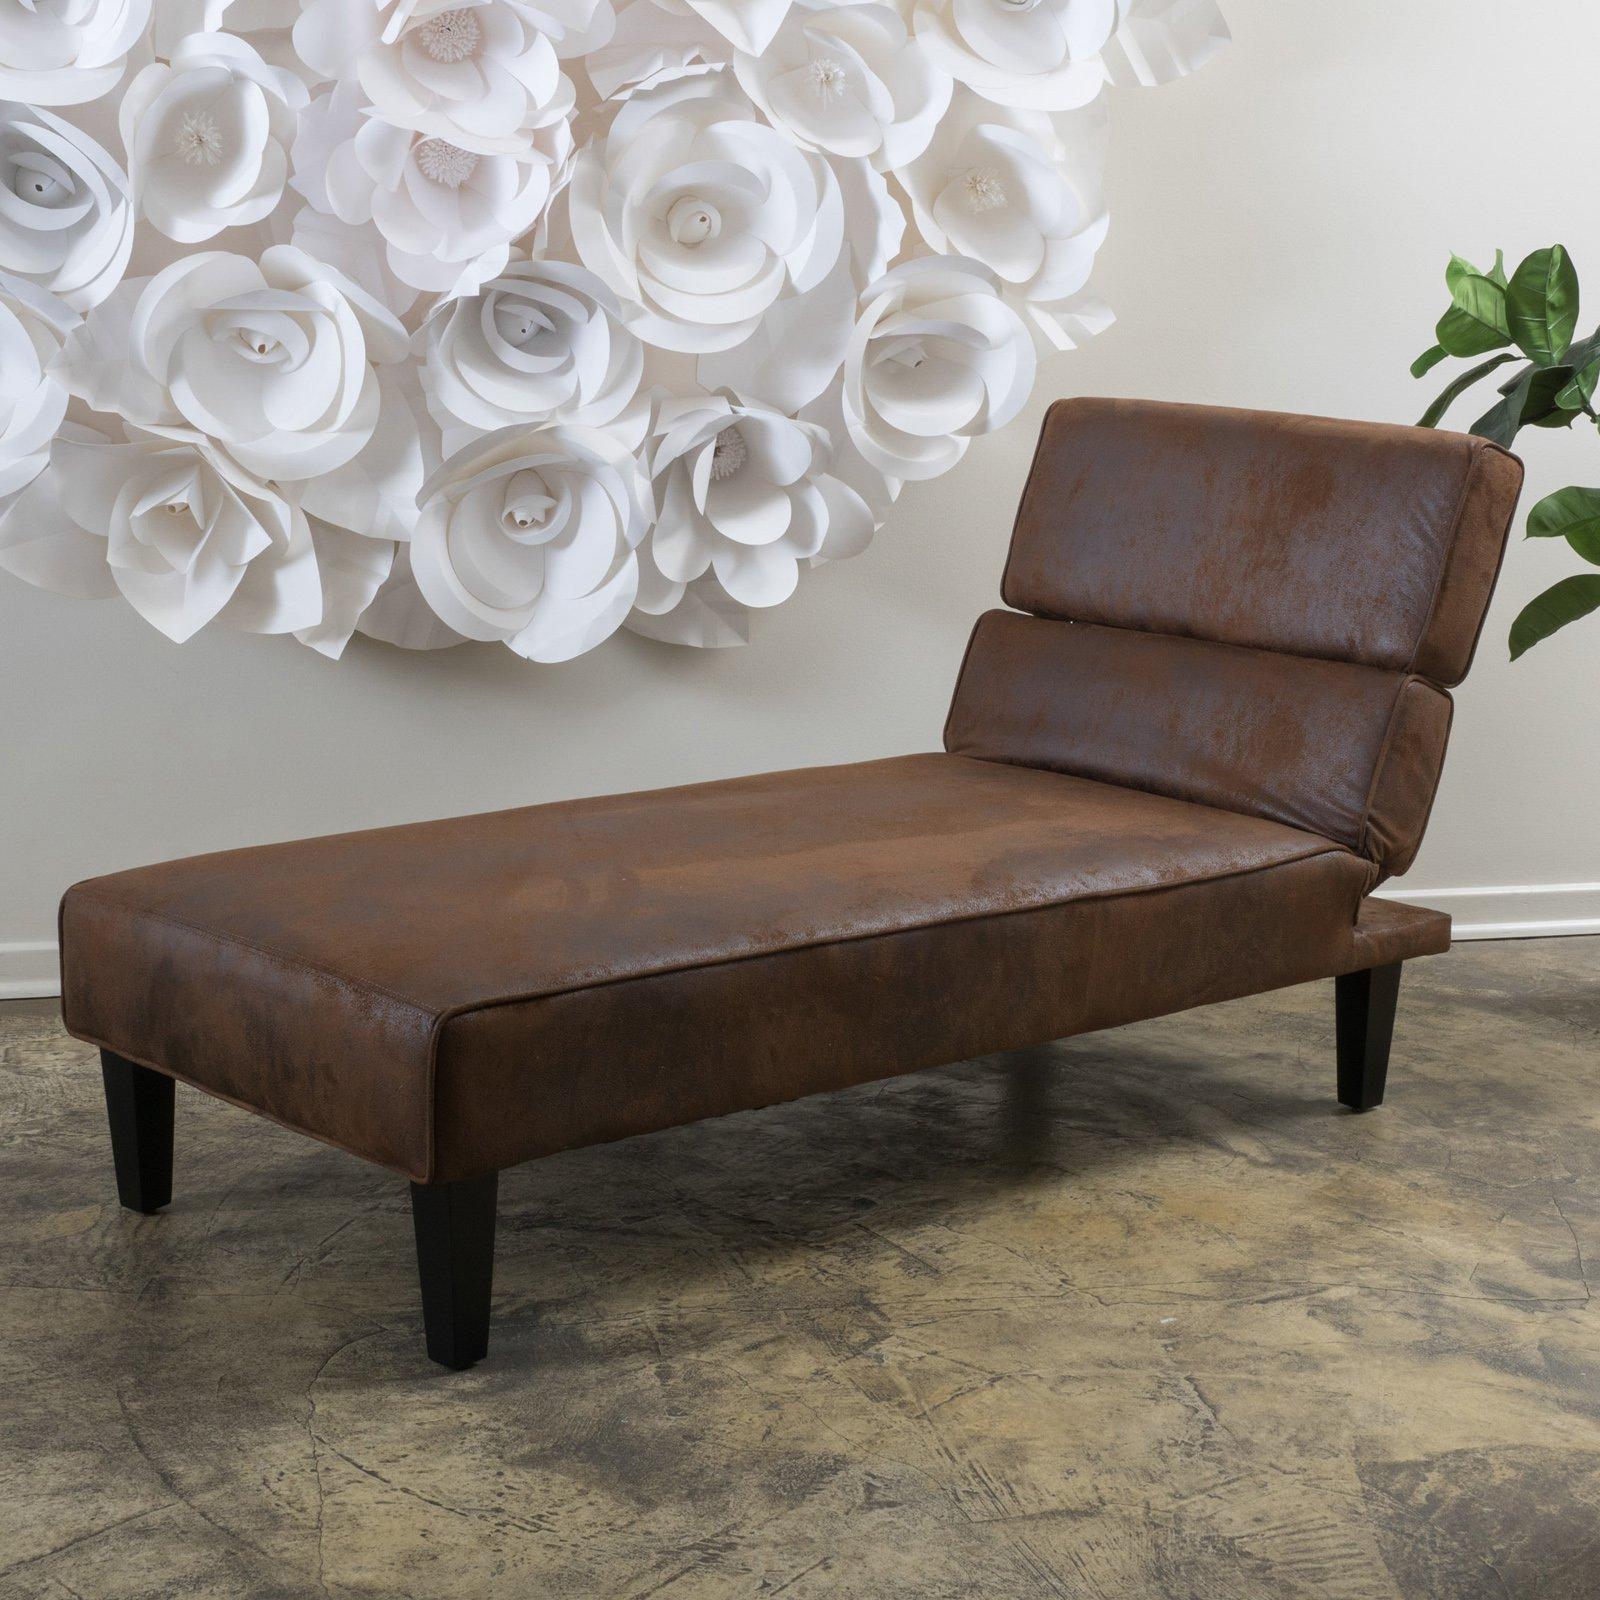 Joanne Microfiber Chaise Lounge